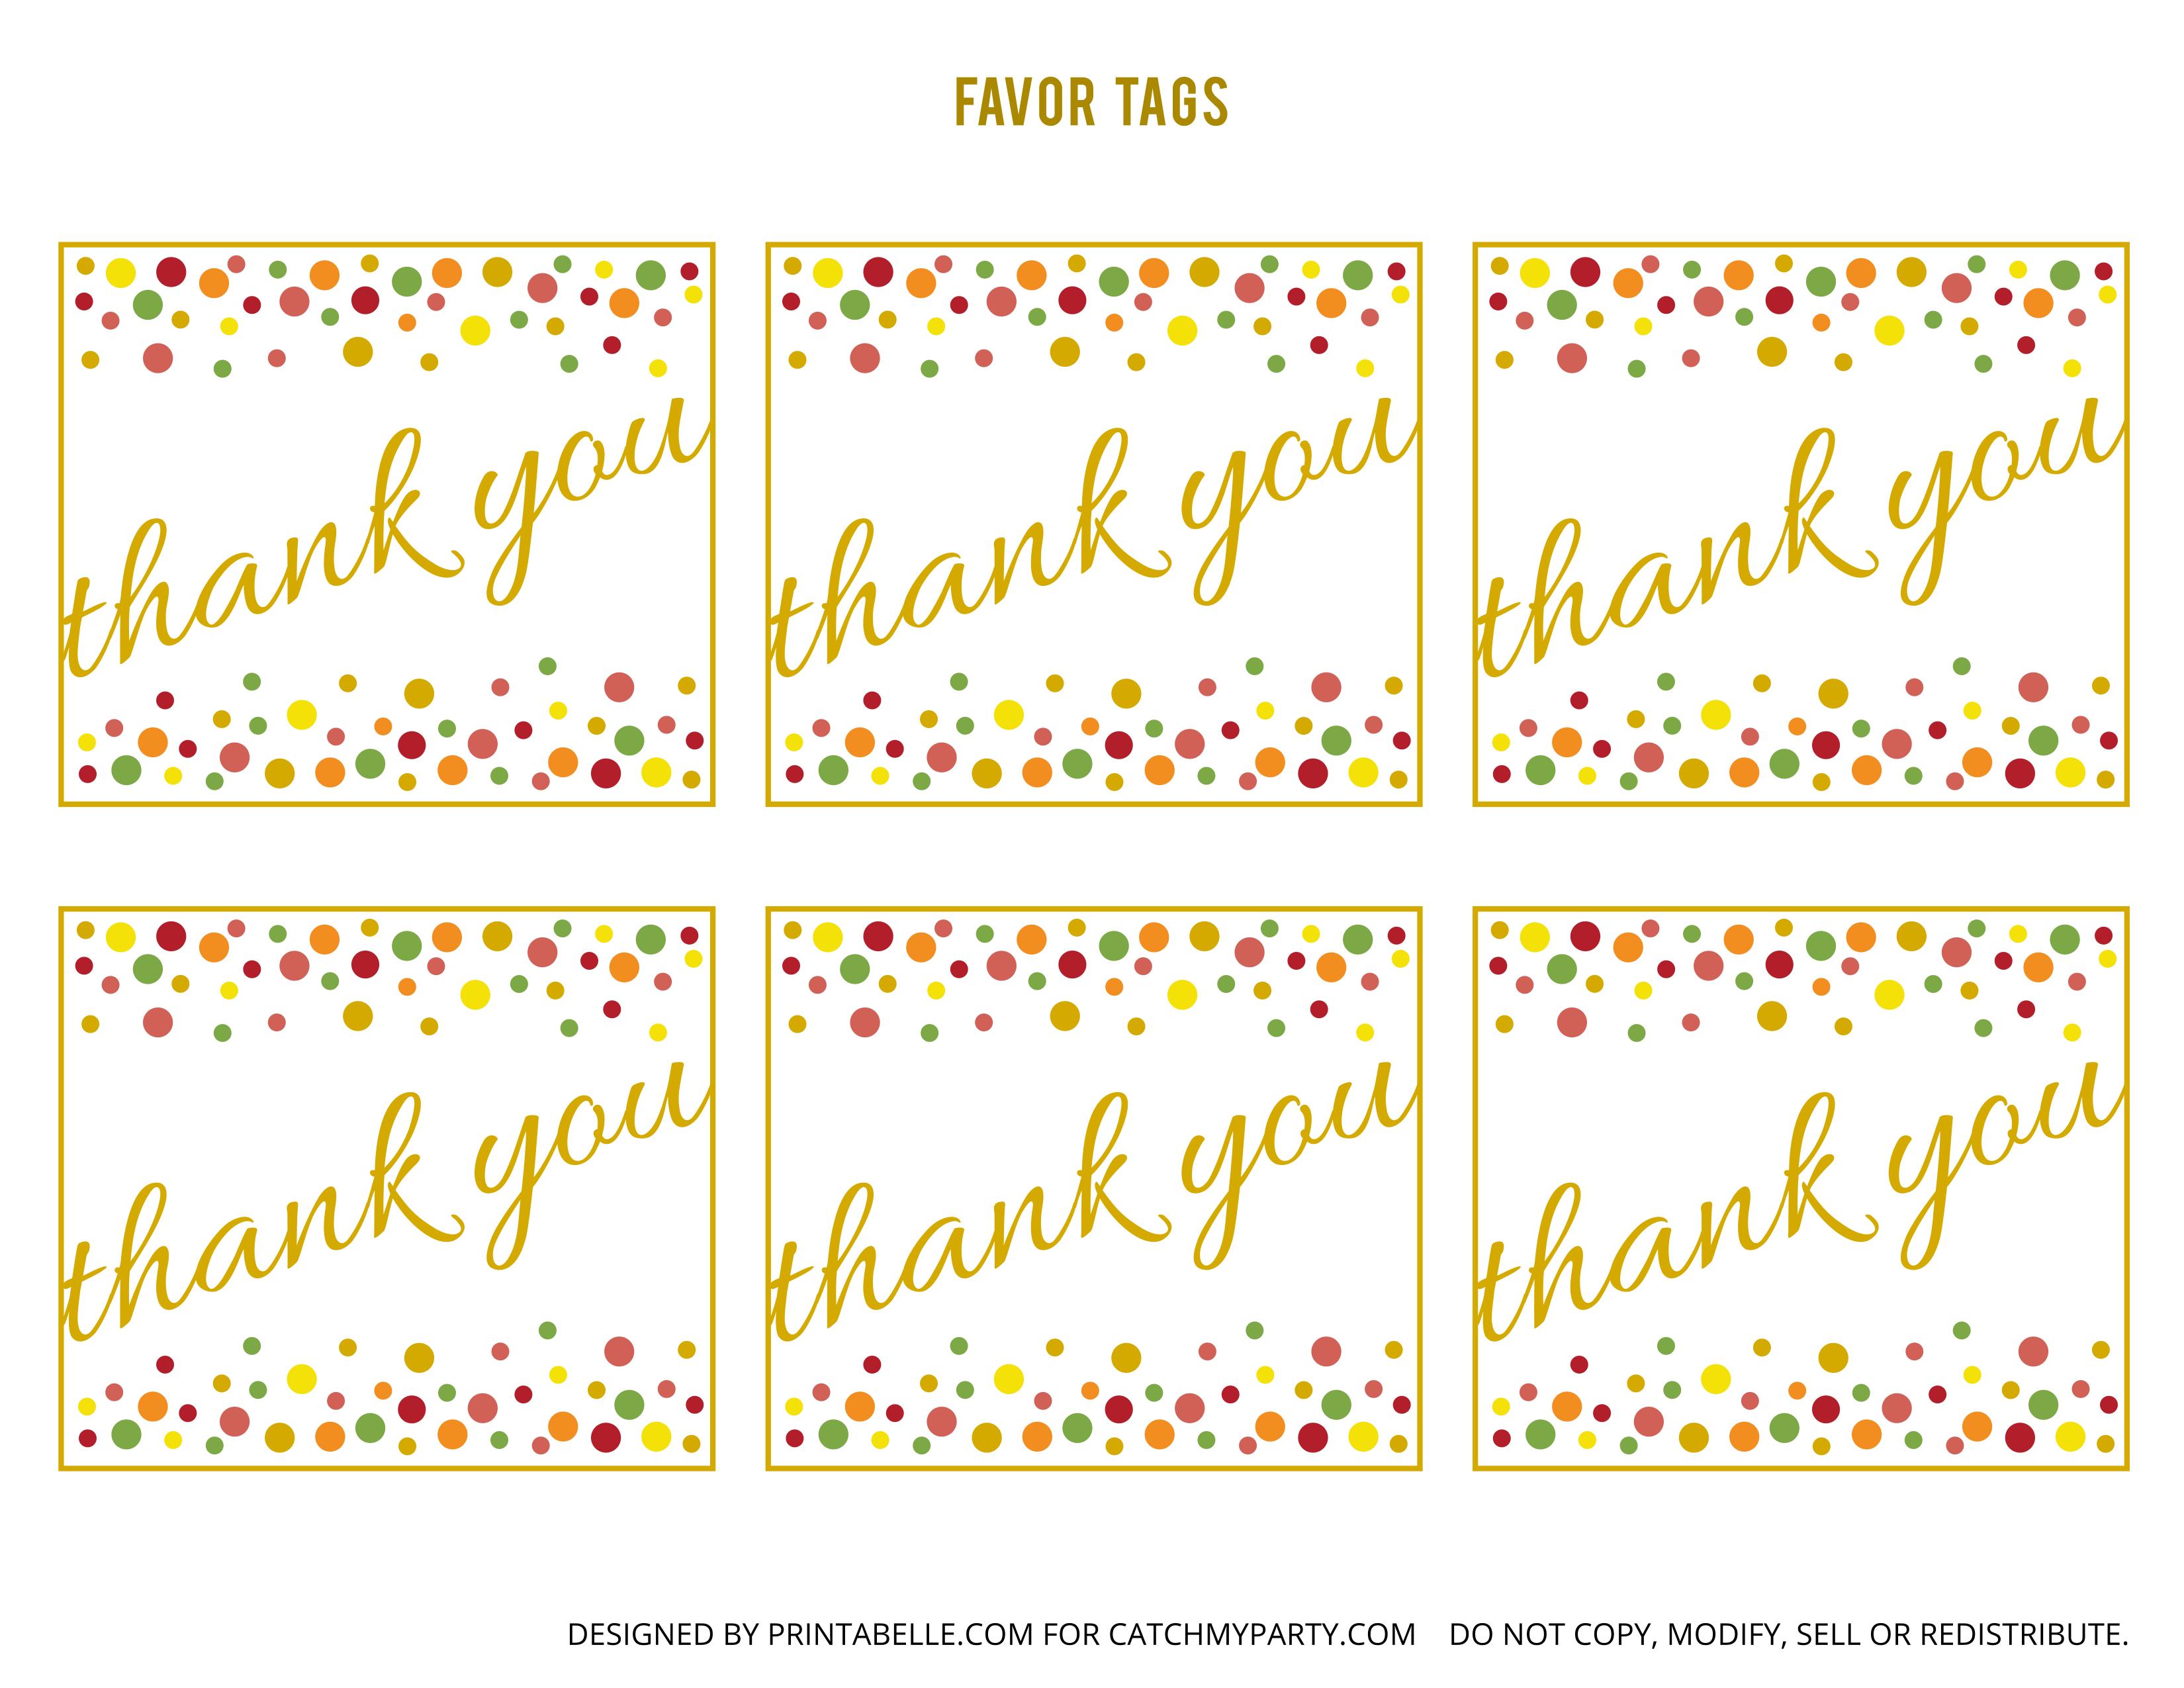 Free Gold And Polka Dot Birthday Printables | Catch My Party - Birthday Party Favor Tags Printable Free